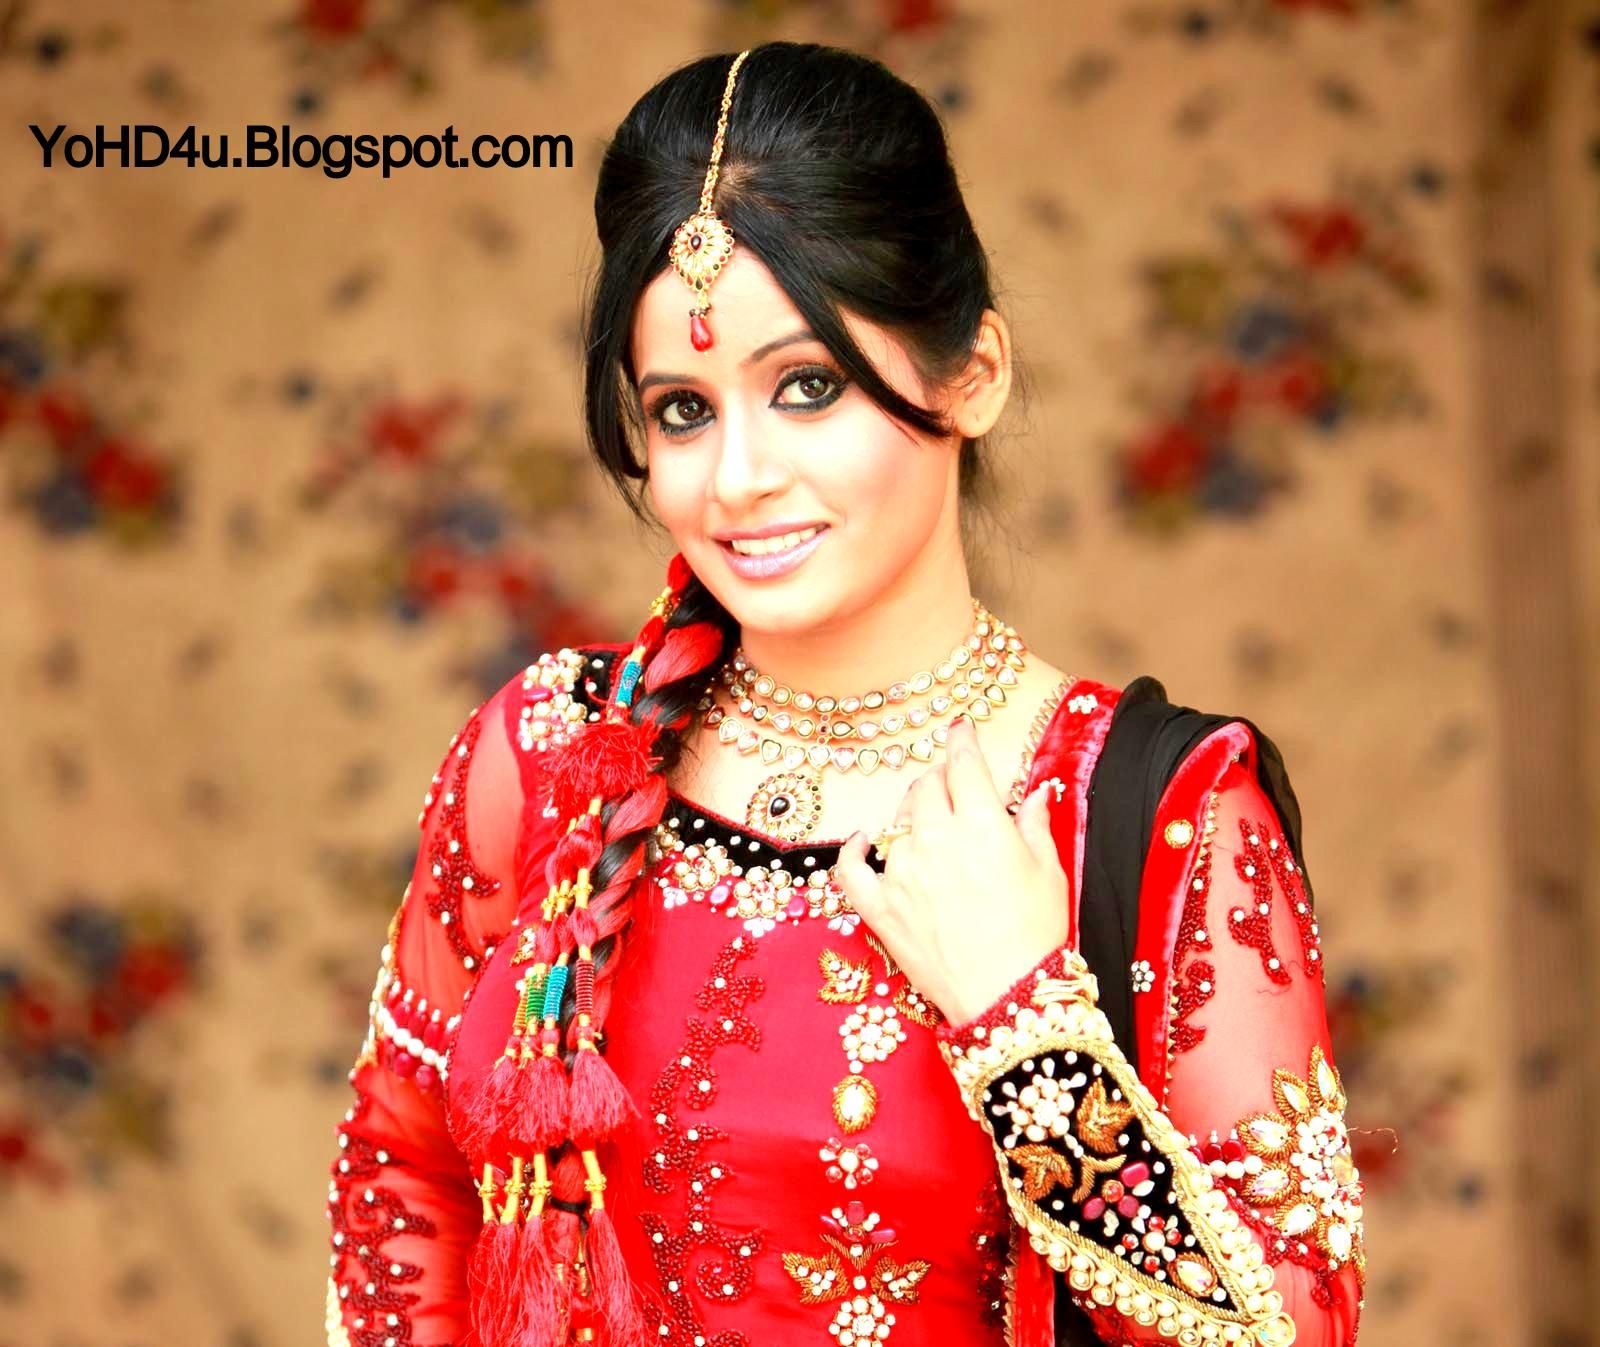 miss pooja new movie des photos, des photos de fond, fond d'écran